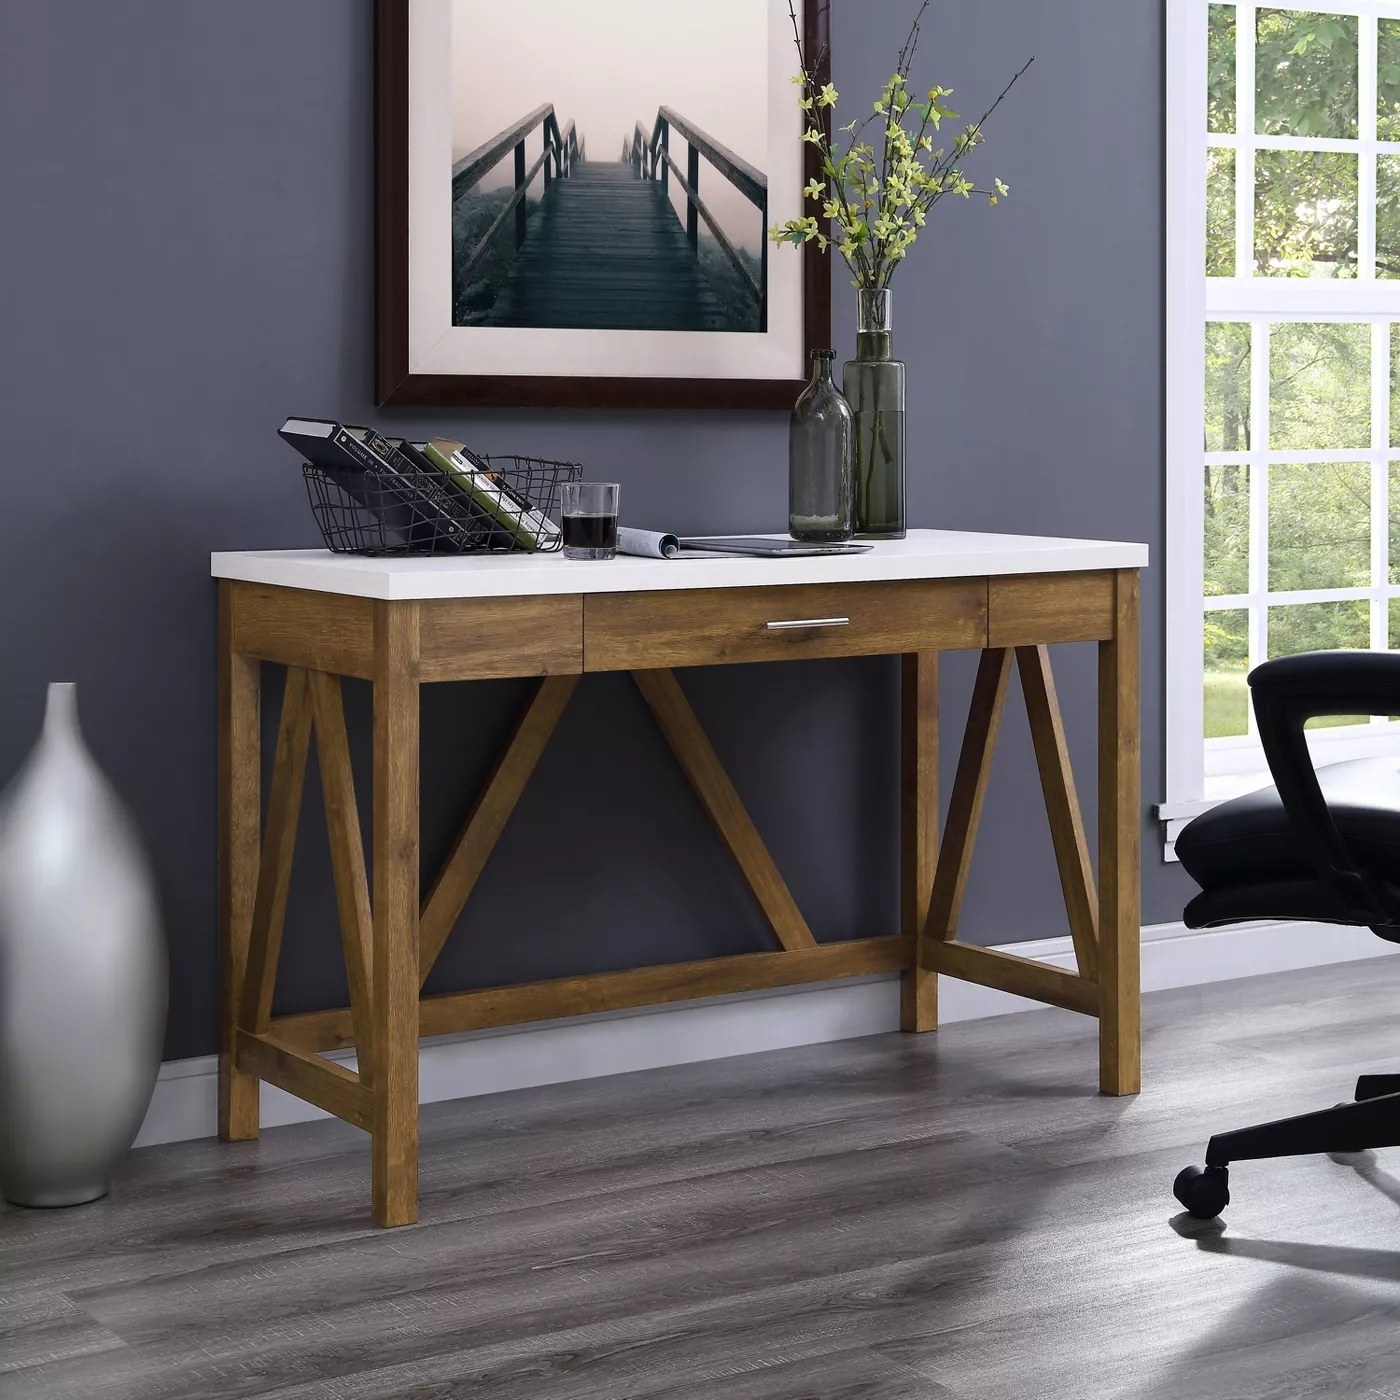 A farmhouse-style, A-frame desk with a white countertop